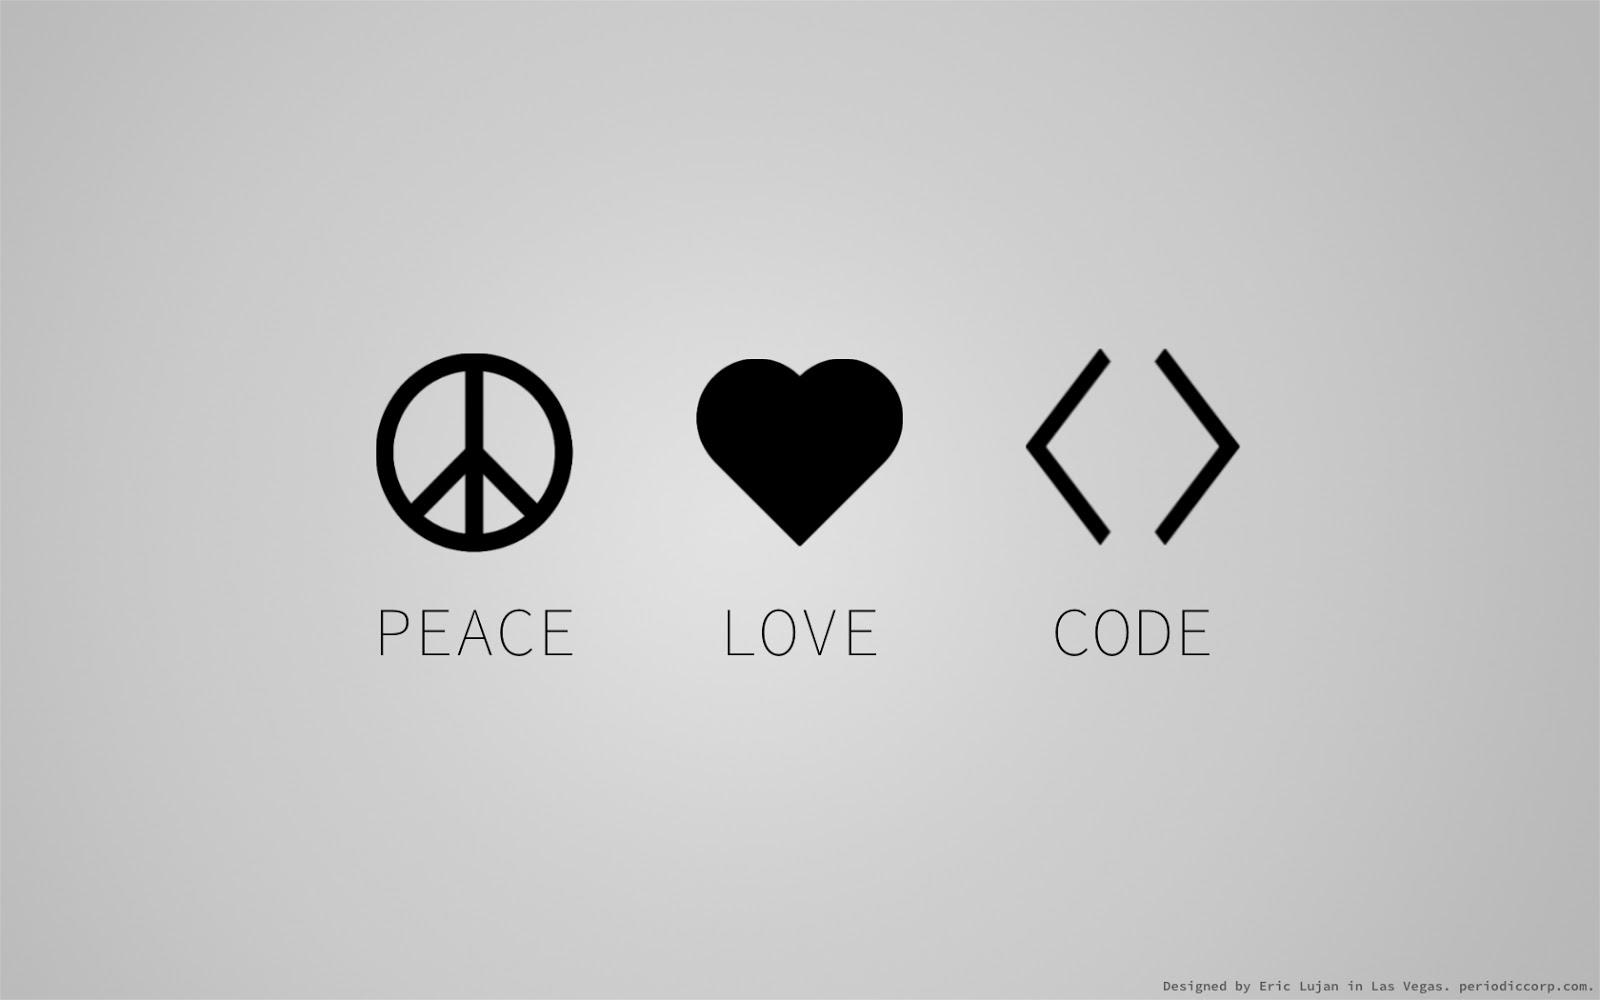 Working with CodeIgniter | My journey into Web Development